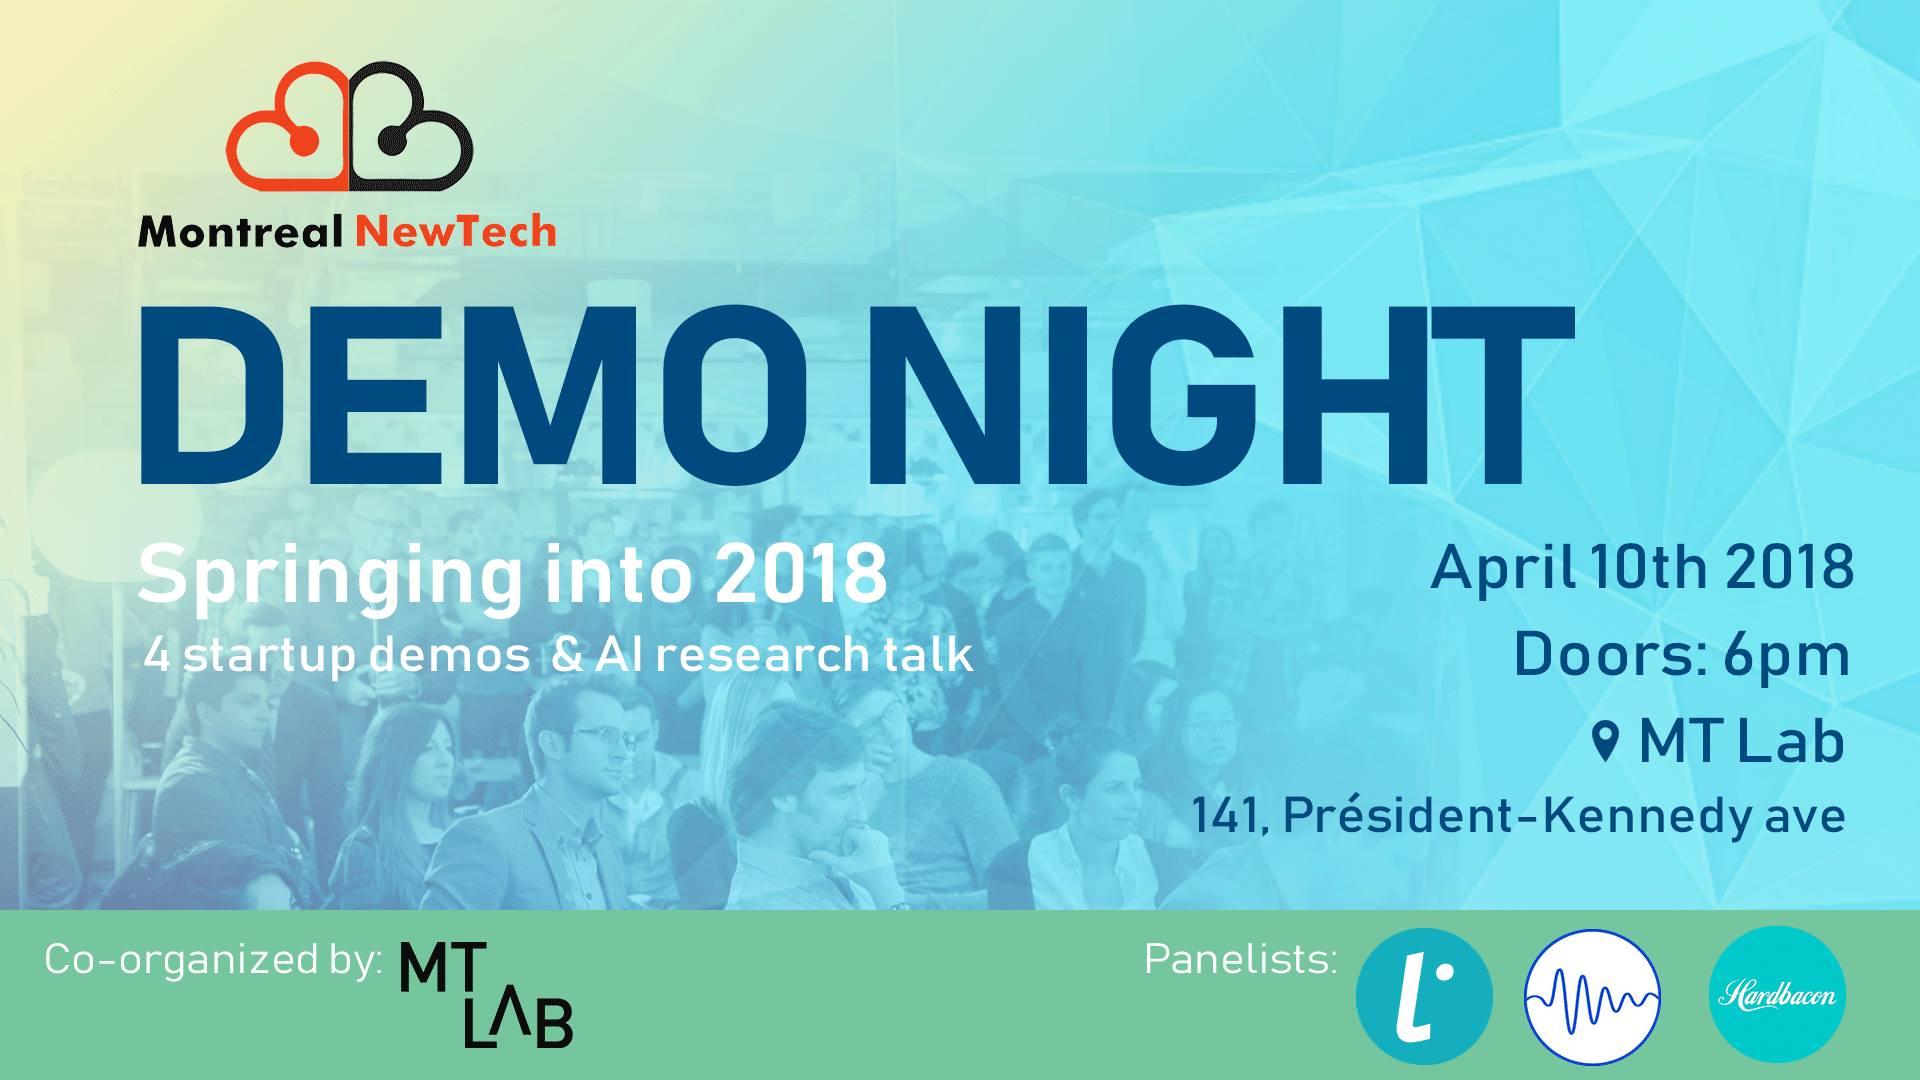 MTLNewTech DemoNight | 4 startups + AI Research | Springing into 2018